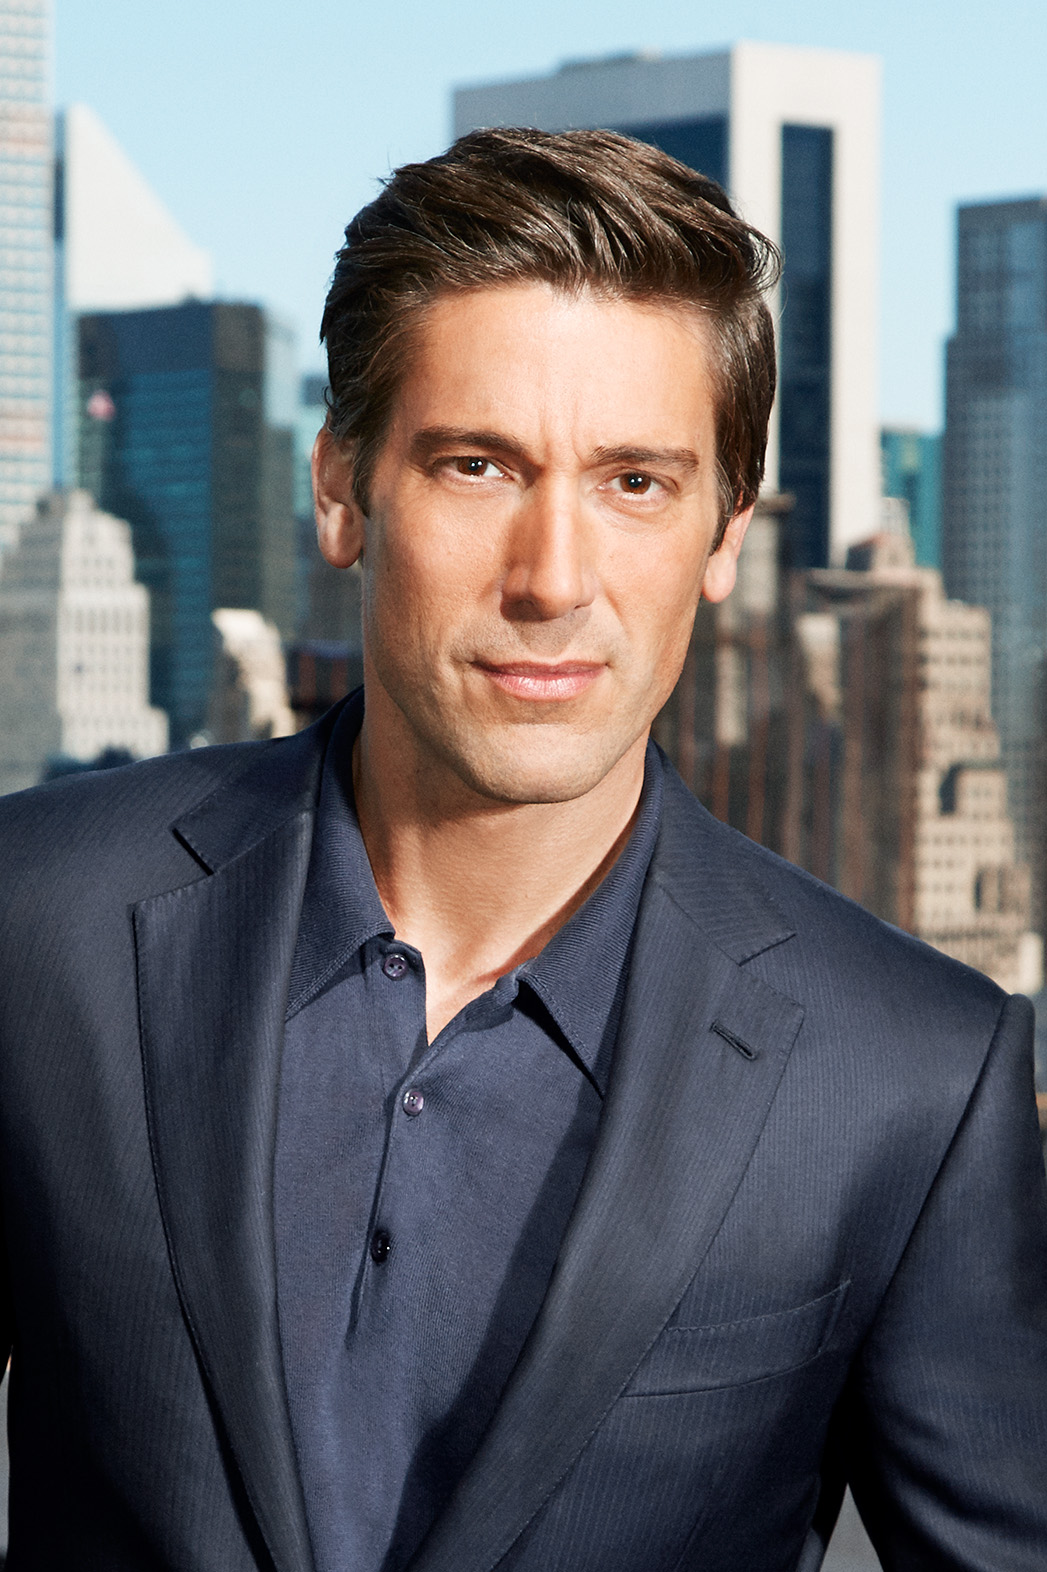 David Muir, ABC World News 6/16/2013   David muir, My